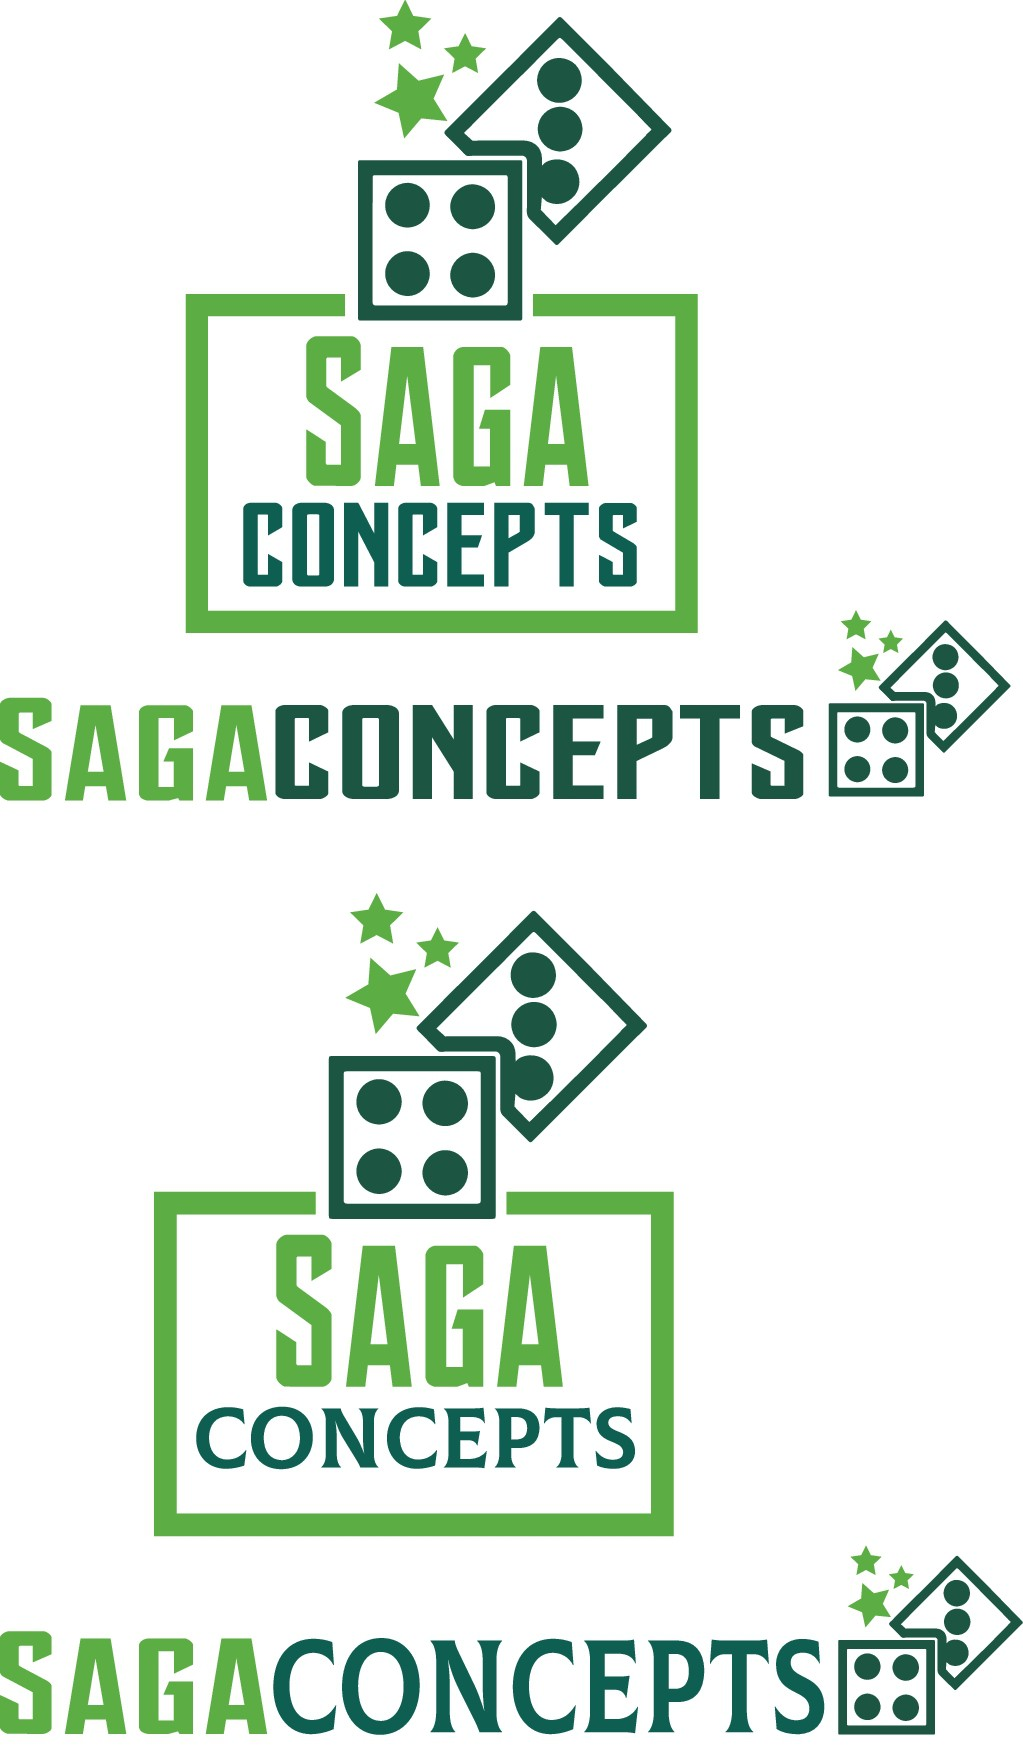 Online Retail Game Company Logo